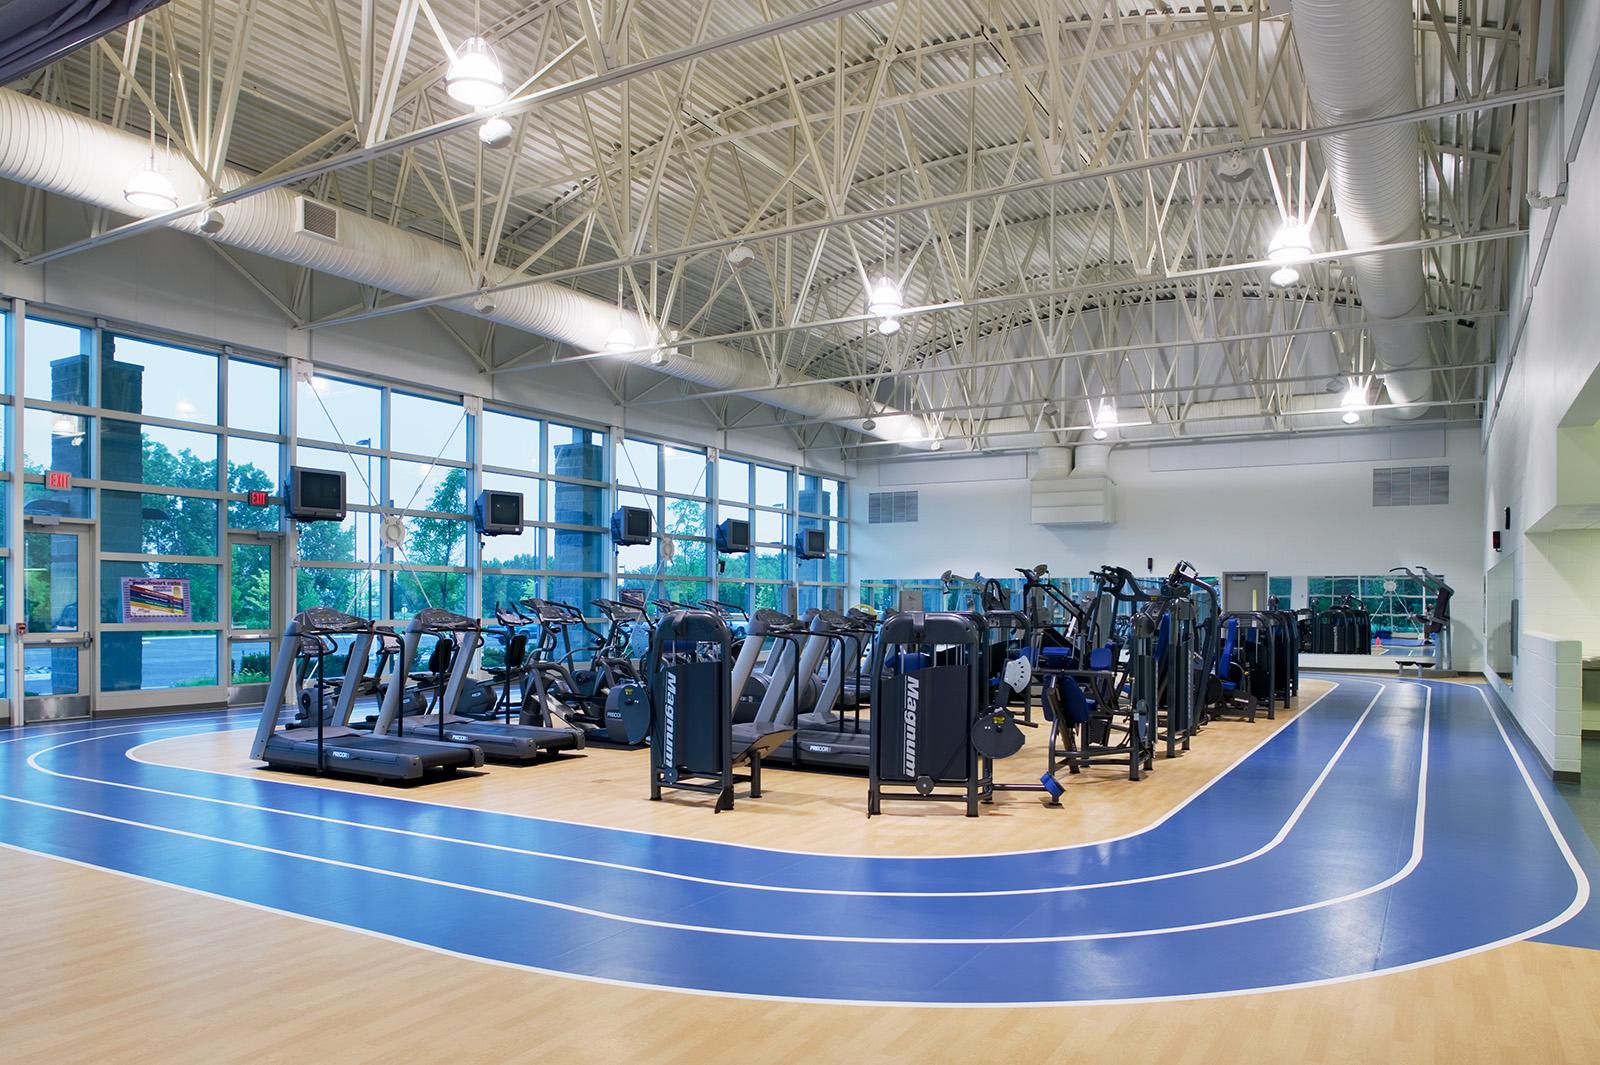 lansing-community-college-mtec-gym